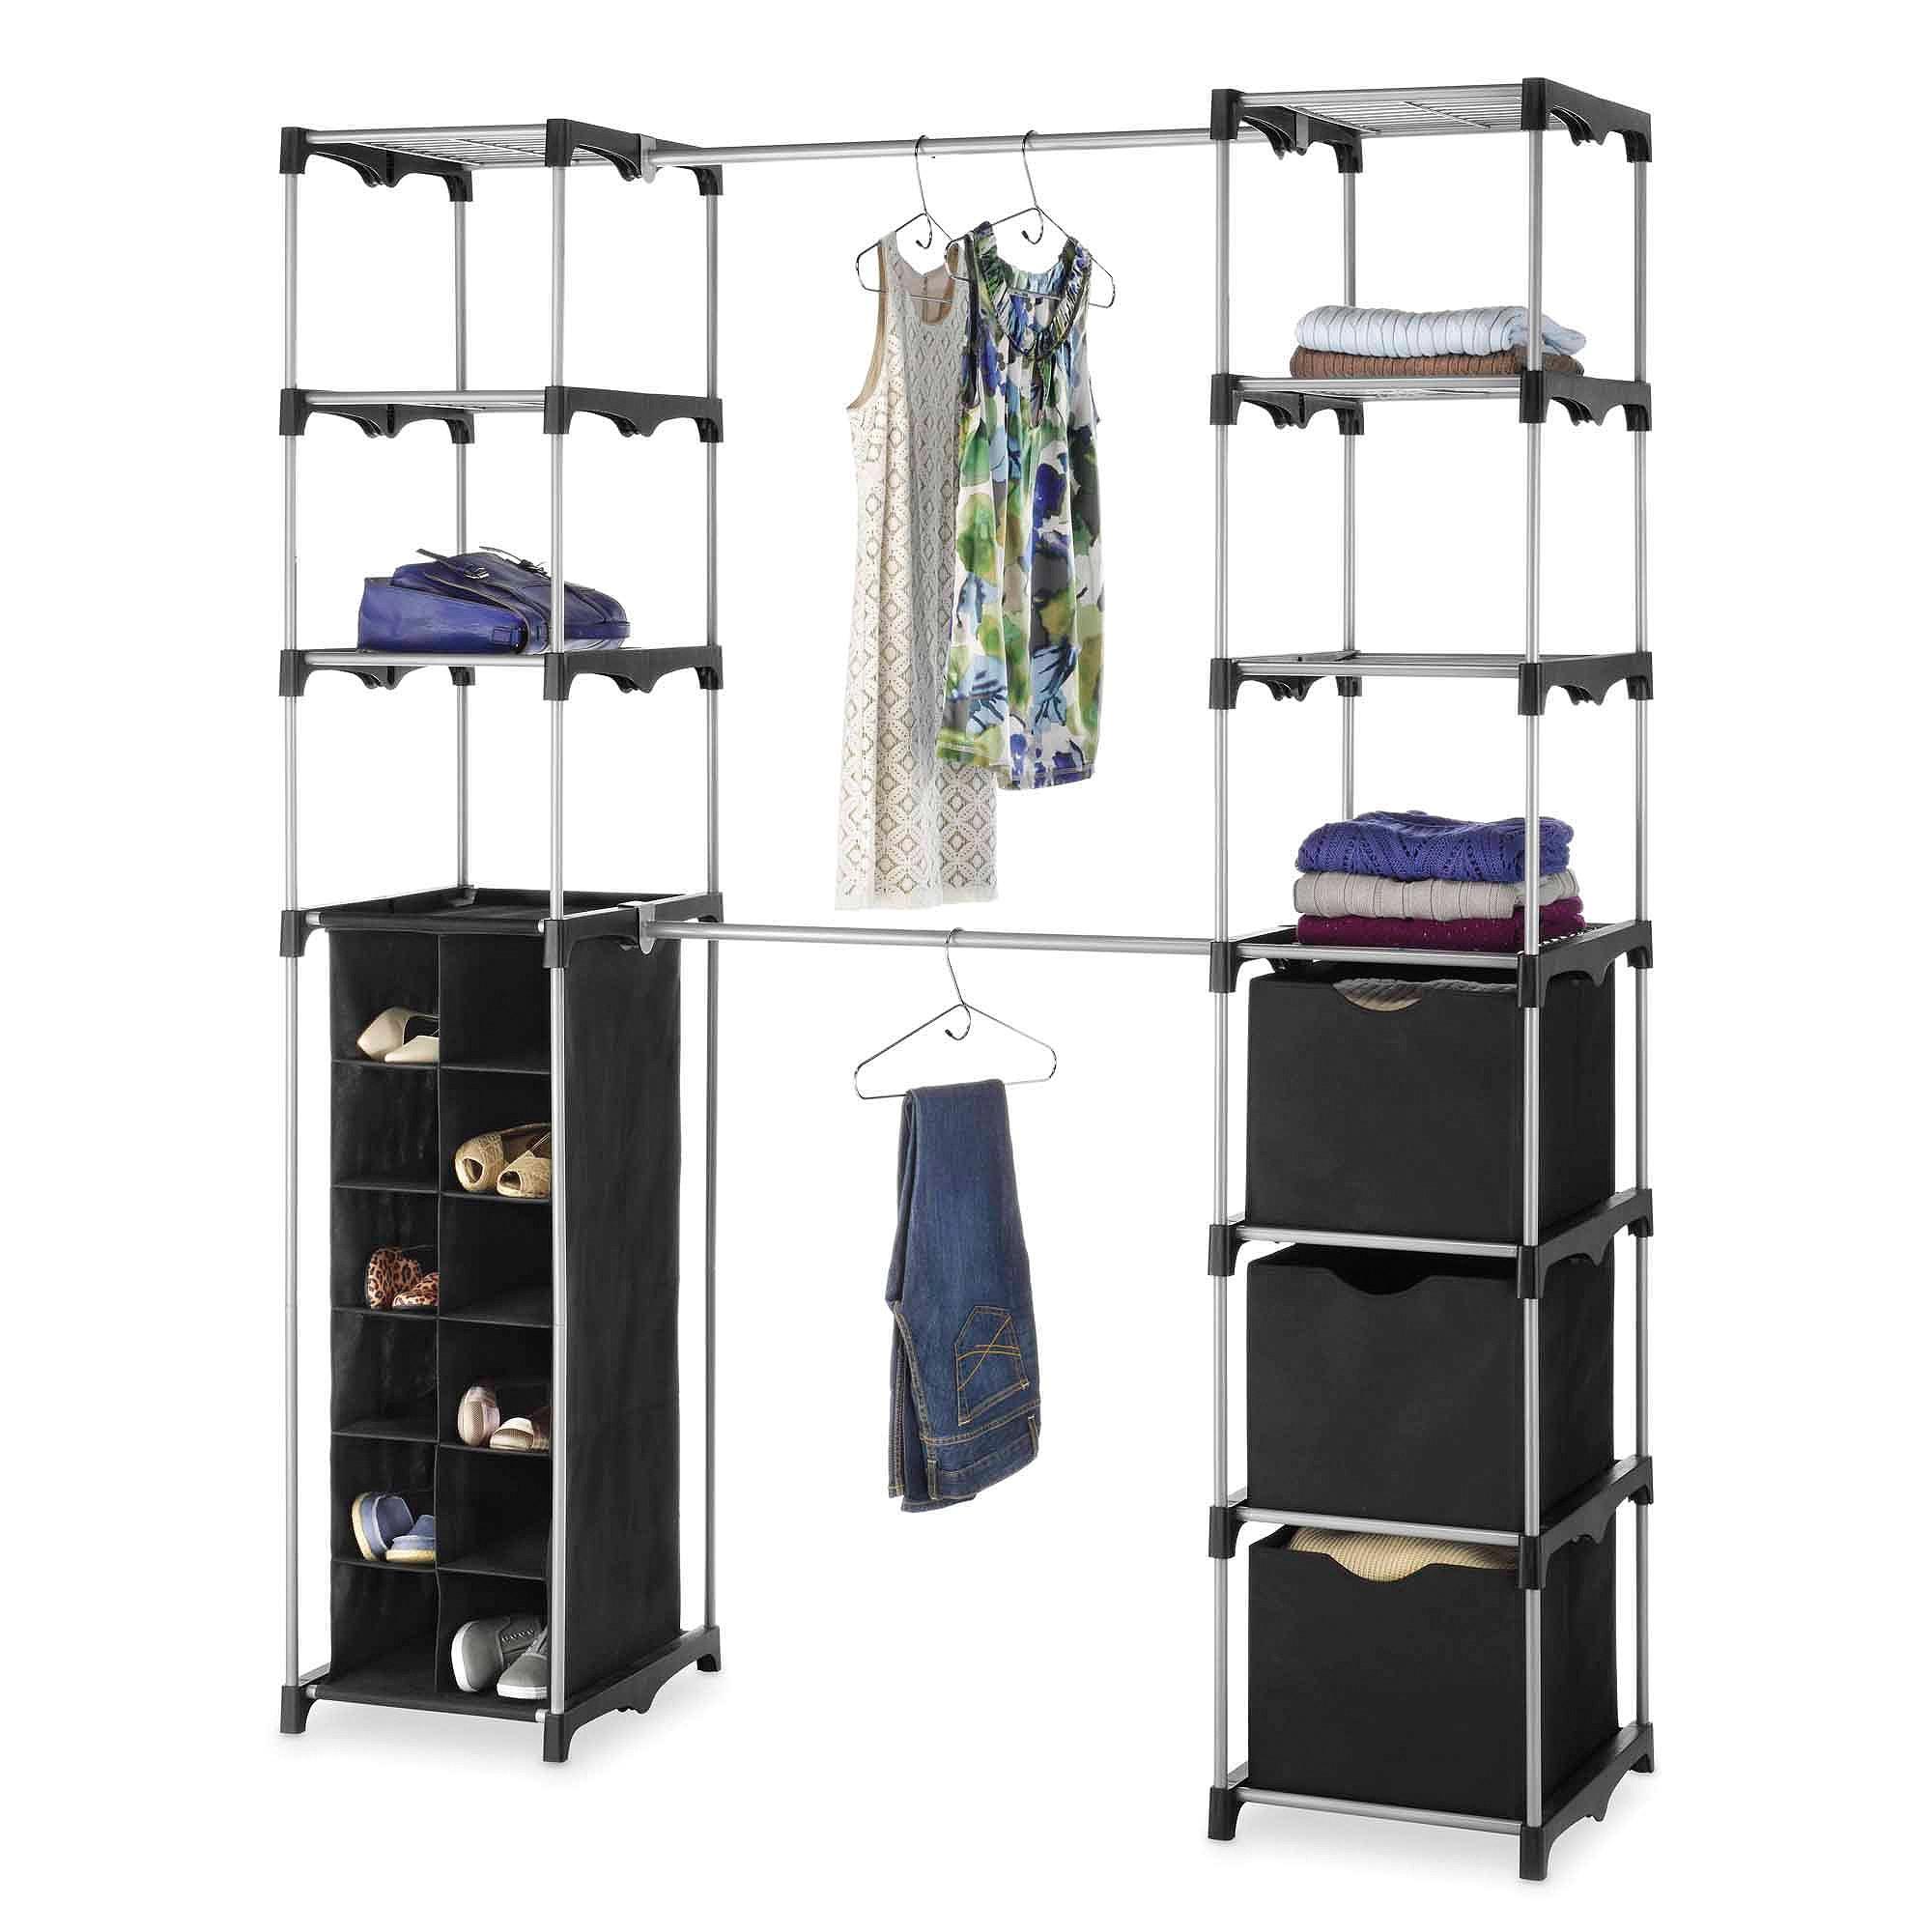 ideas organizer bins walmart clothes rack closet storage as well gorgeous walmarty wardrobe walmarti 0d